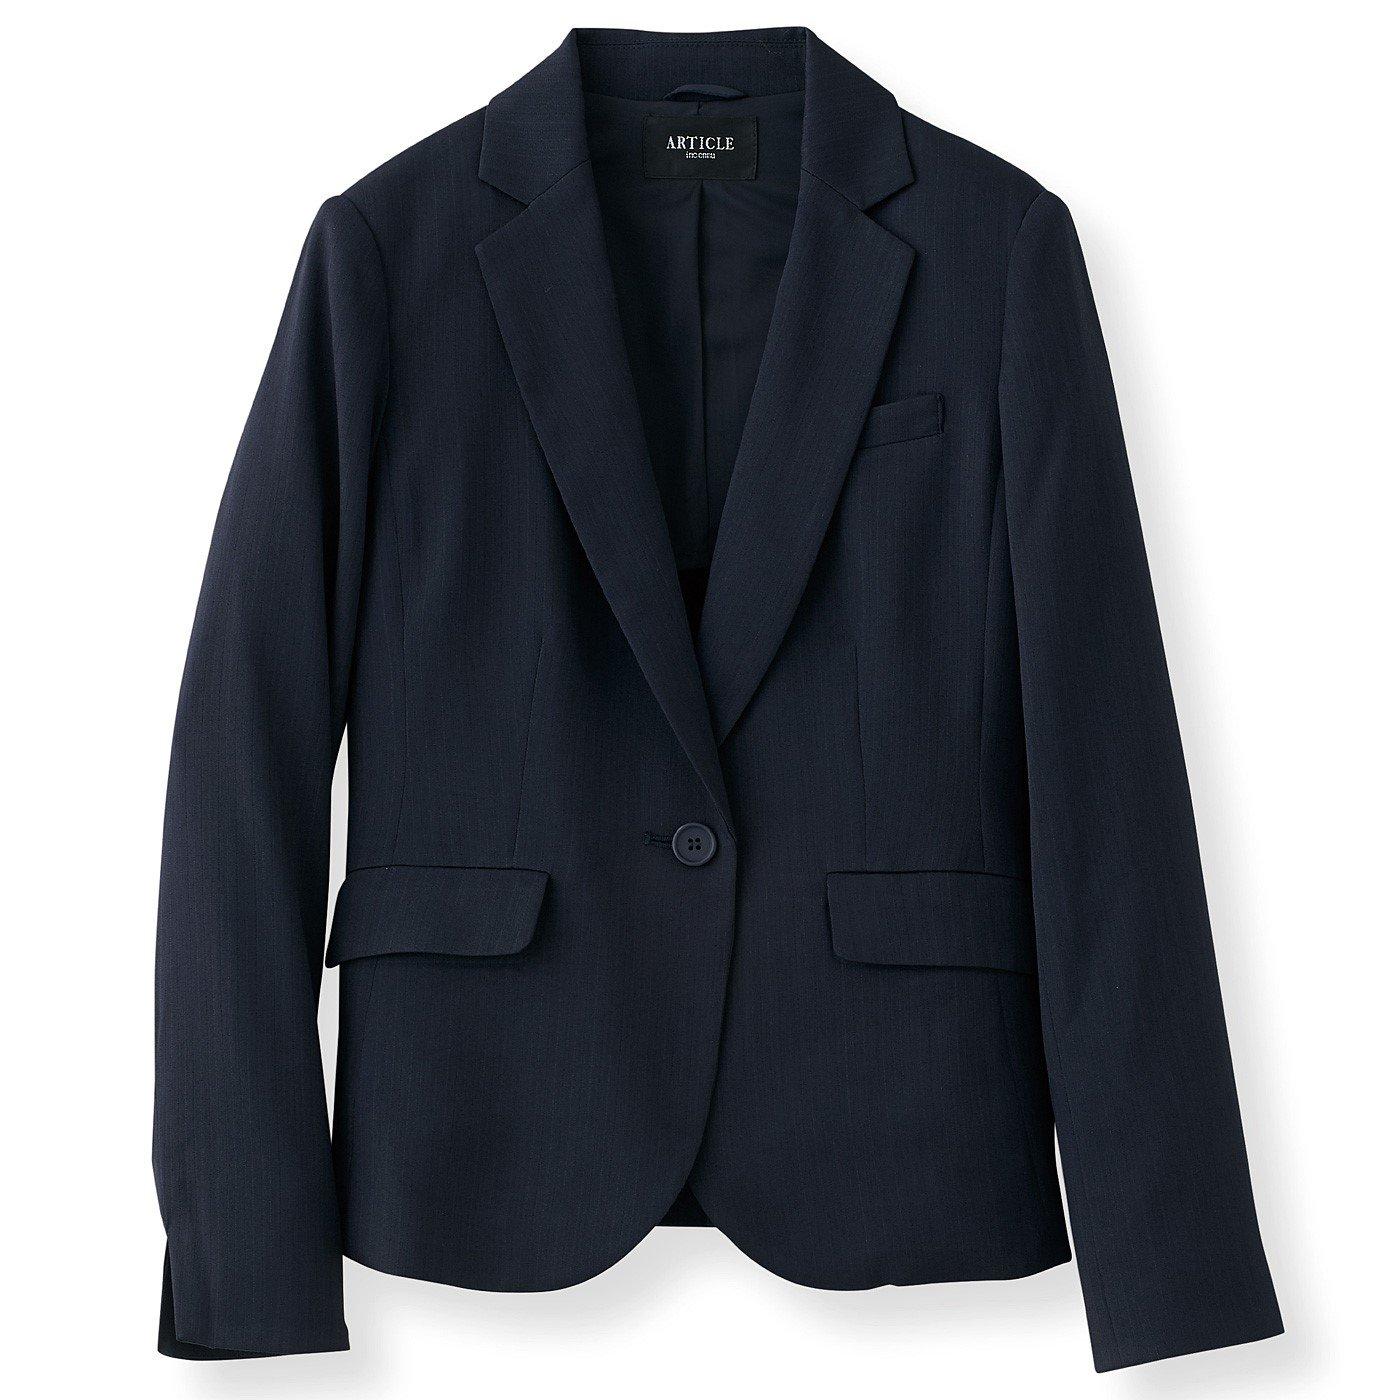 DRECOバイヤーズセレクト 上品光沢のストライプ洗練スーツジャケット〈ネイビー〉